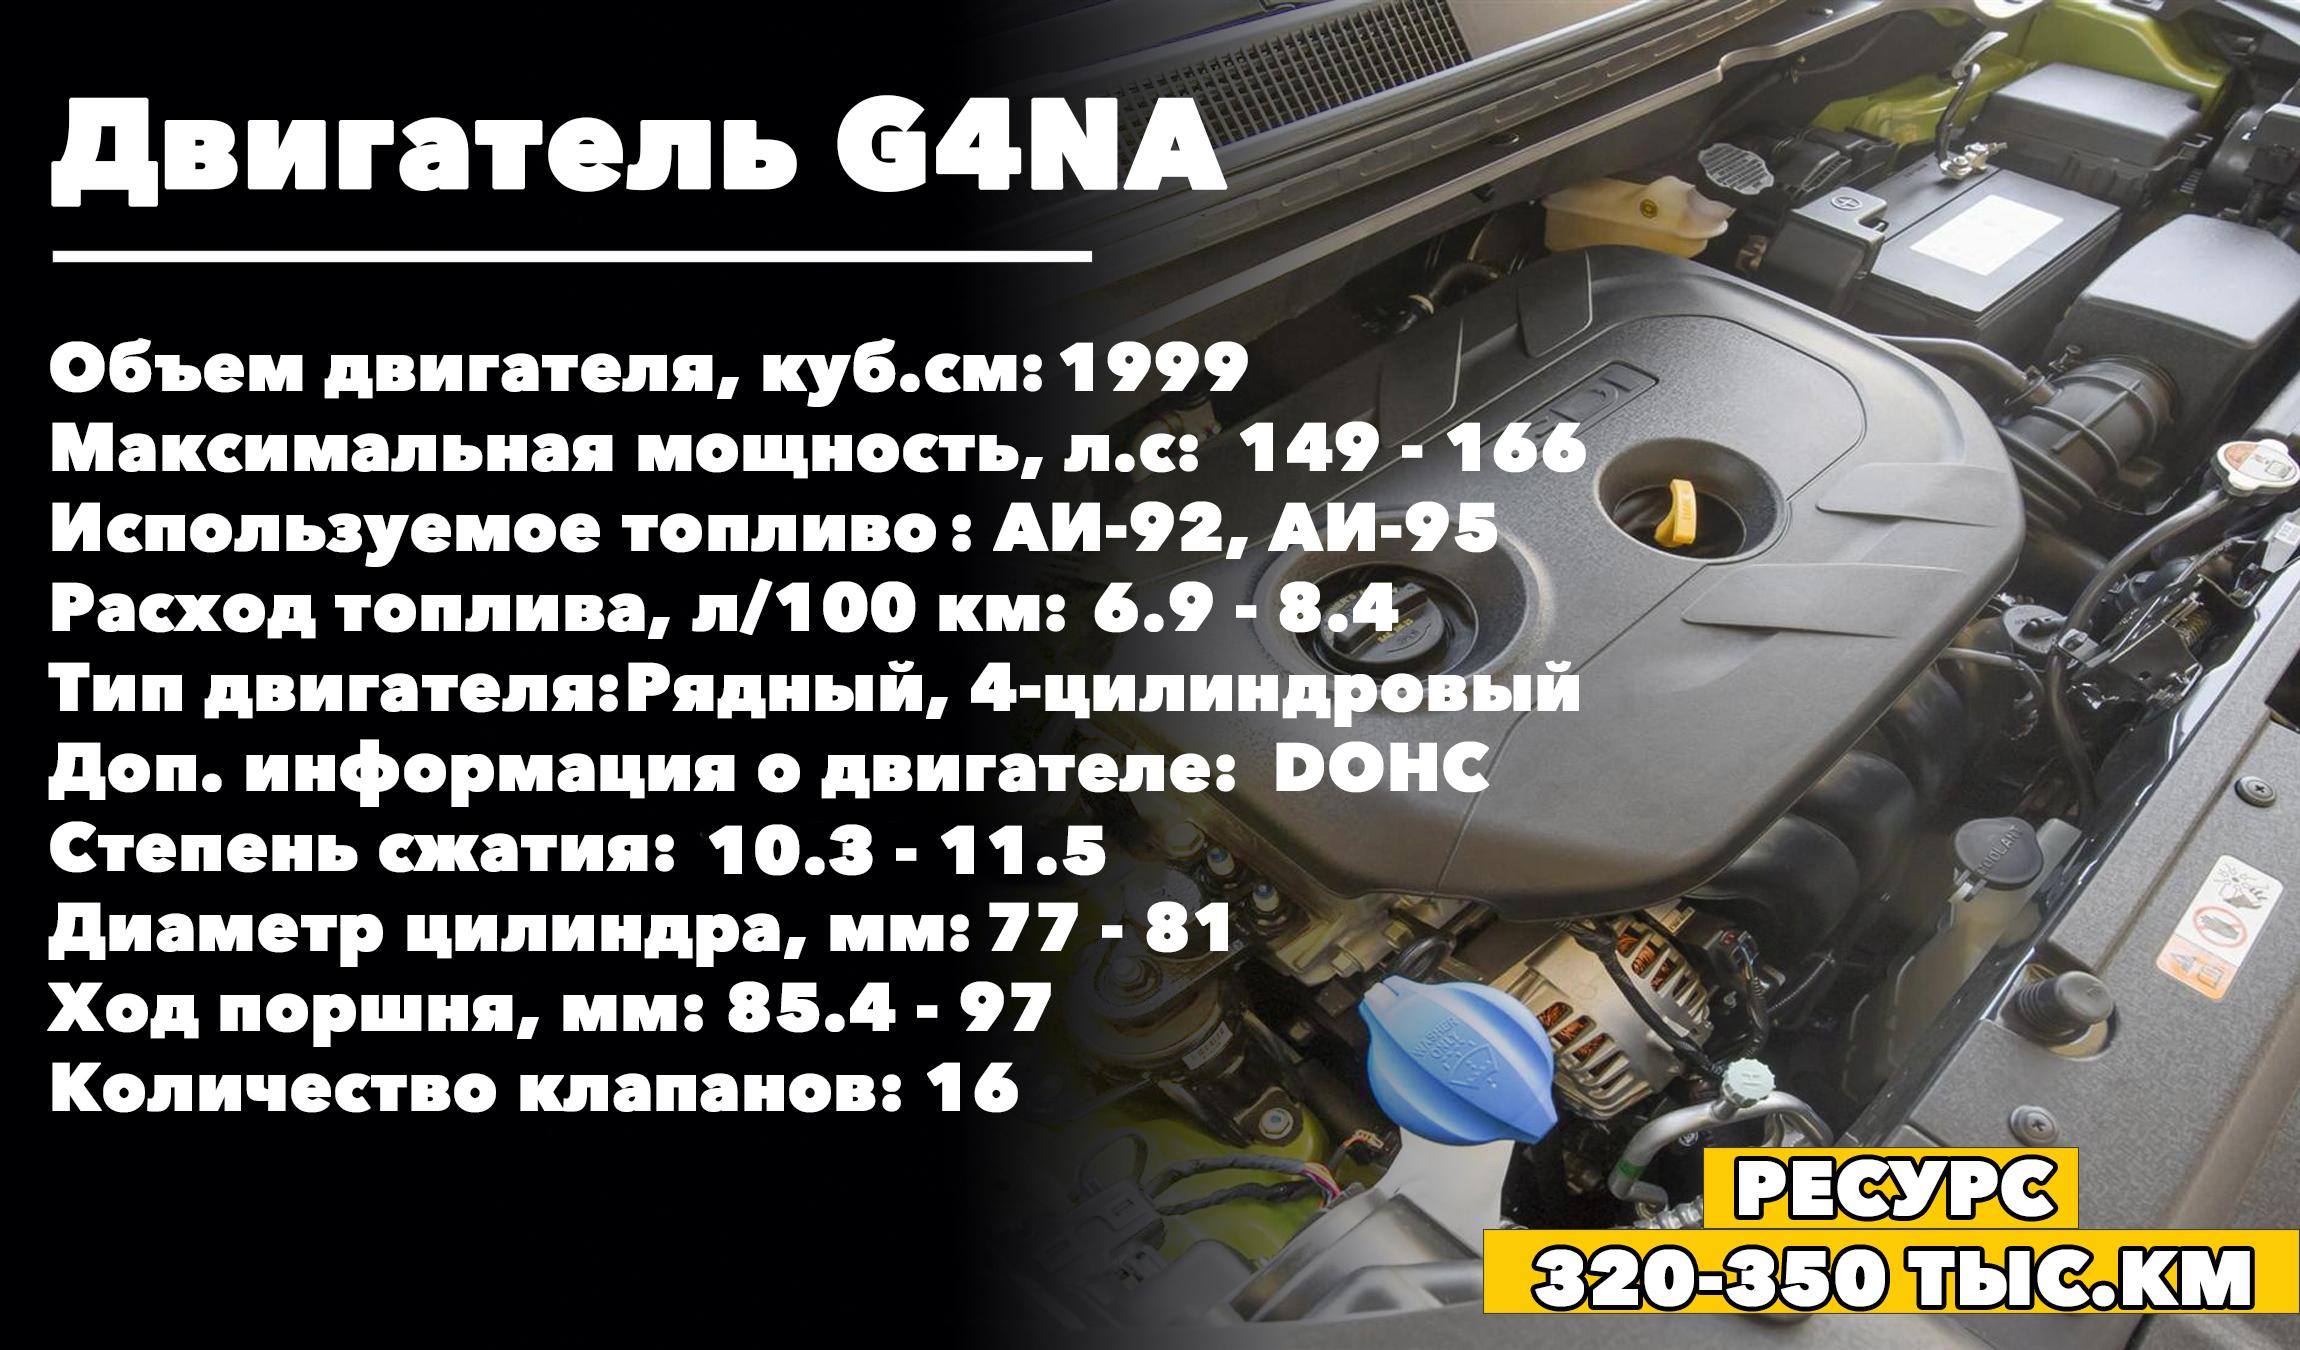 Потенциальный ресурс 2.0 G4NA